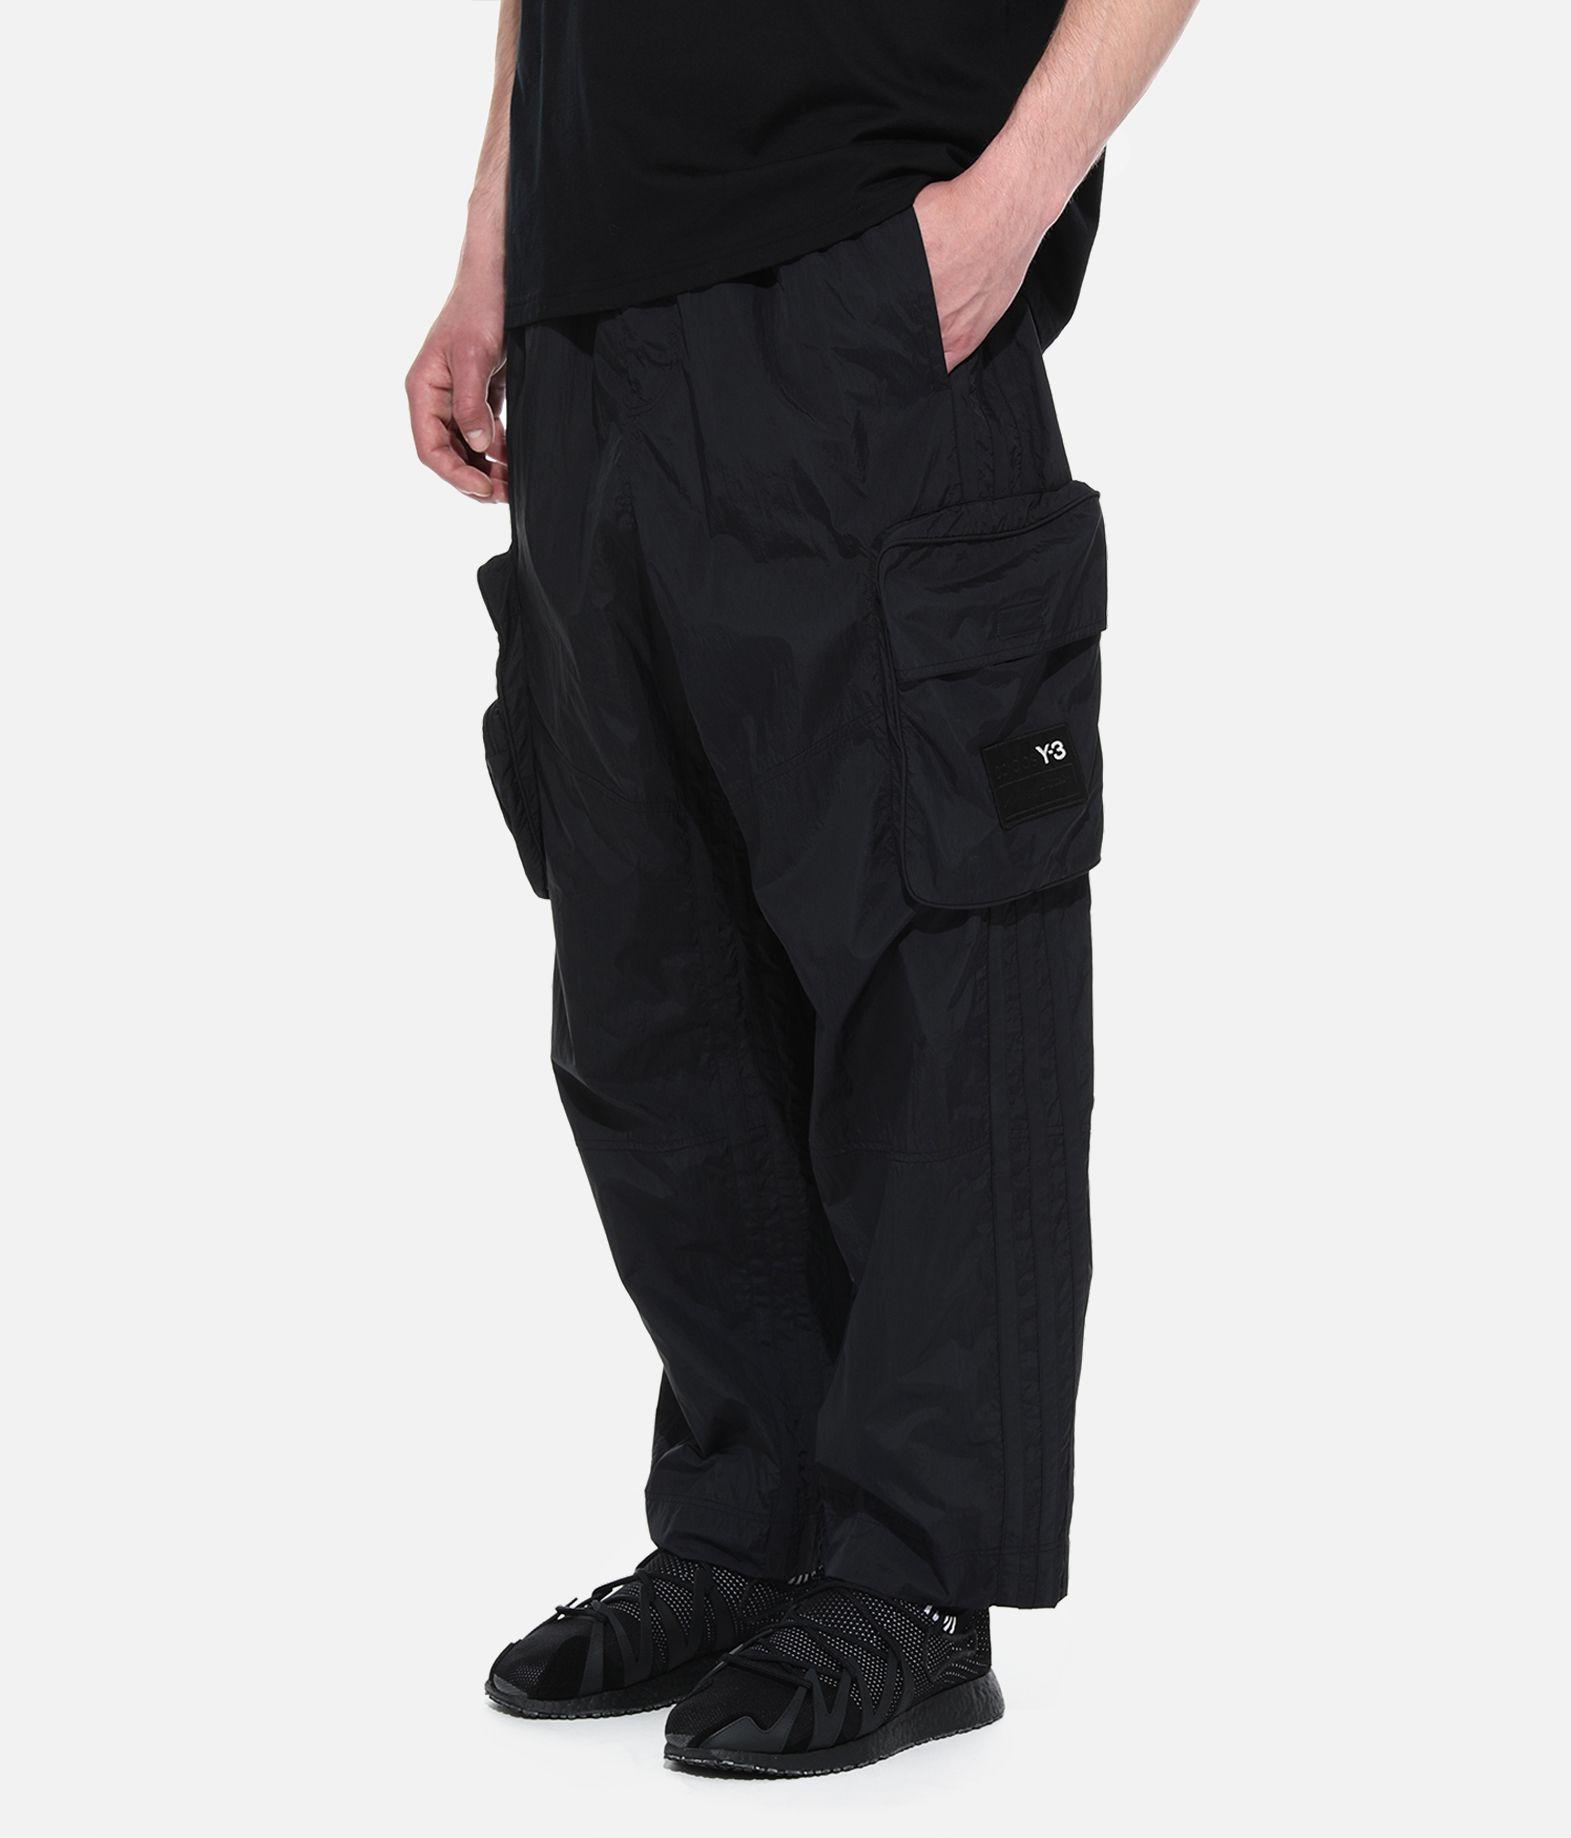 Y-3 Y-3 Shell Track Pants Track pant Man e